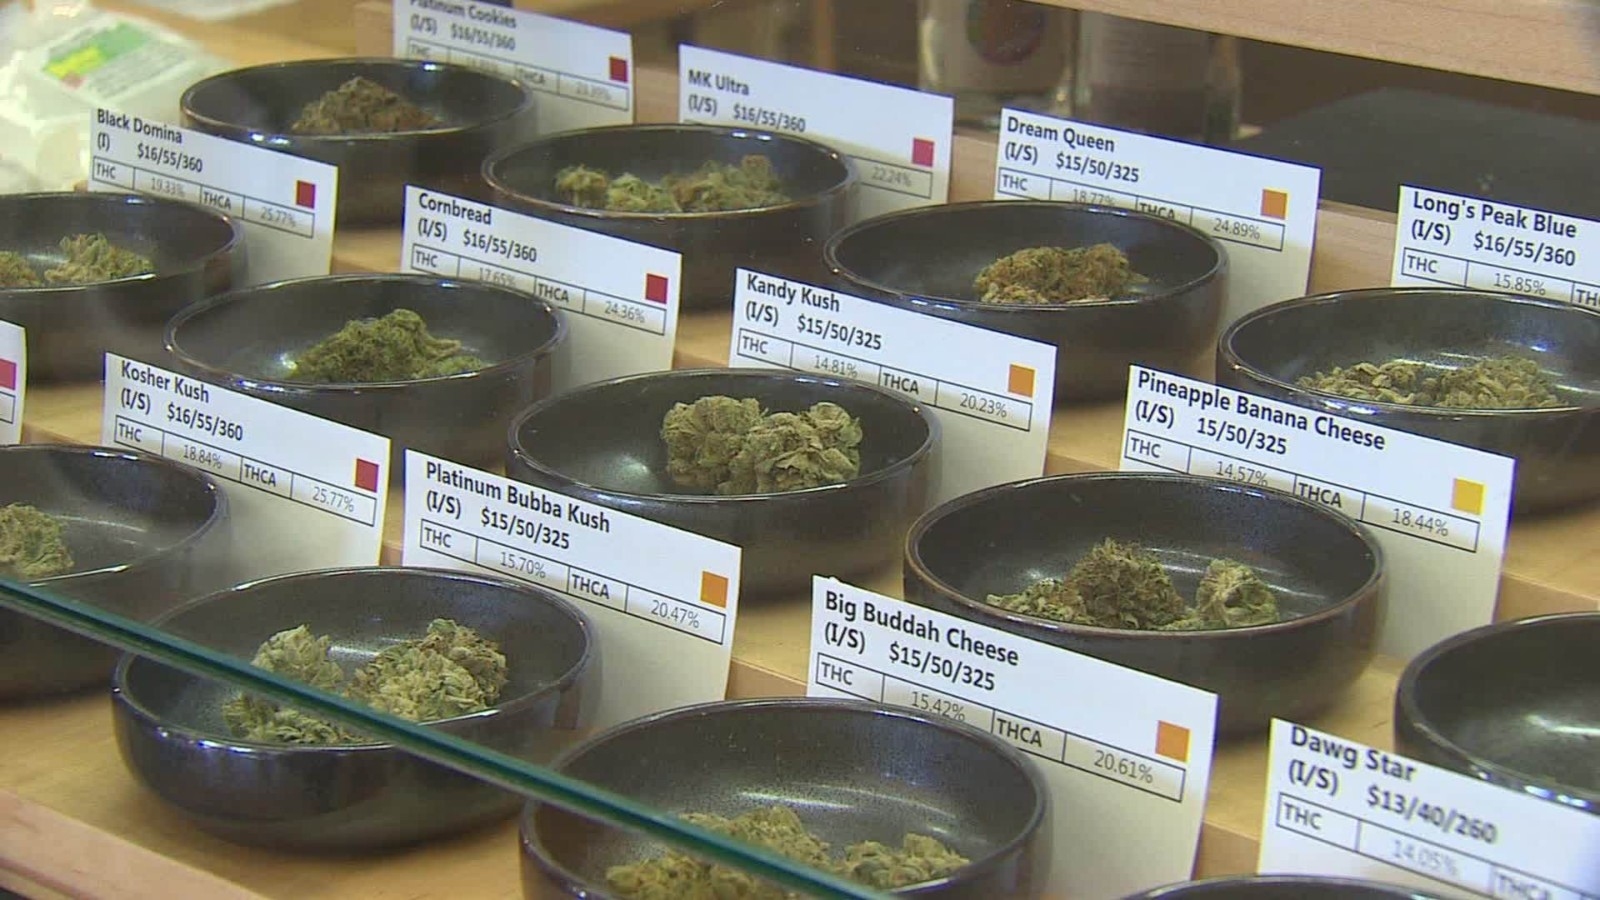 Maine Recount Concludes Yes To Recreational Marijuana CNN - Marijuana map ot the us